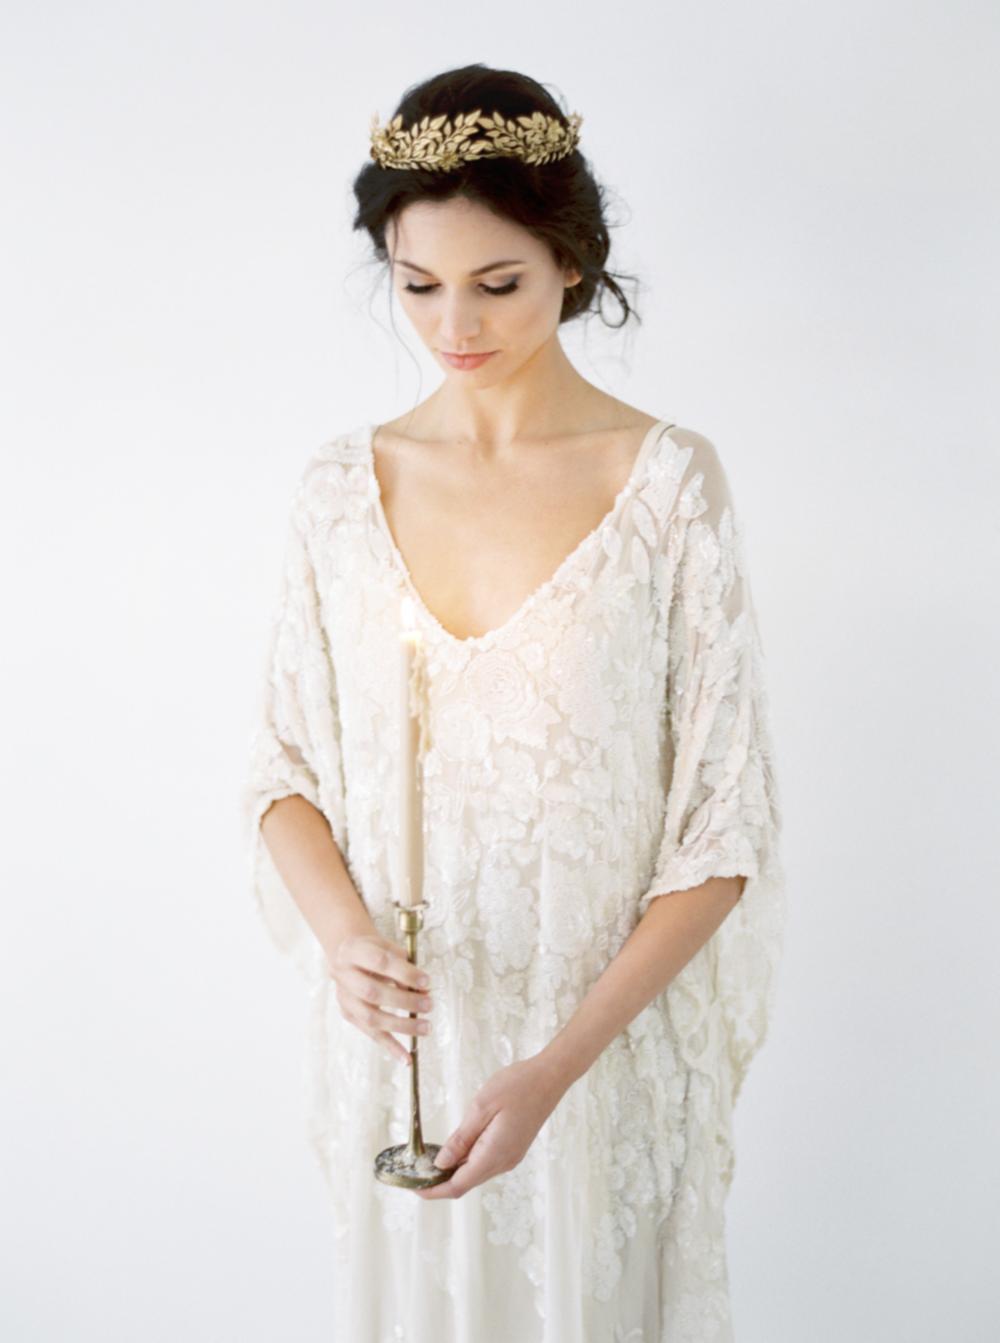 Carol Hannah Bridal Iolite Gown Shanon Moffit Photography 8.png